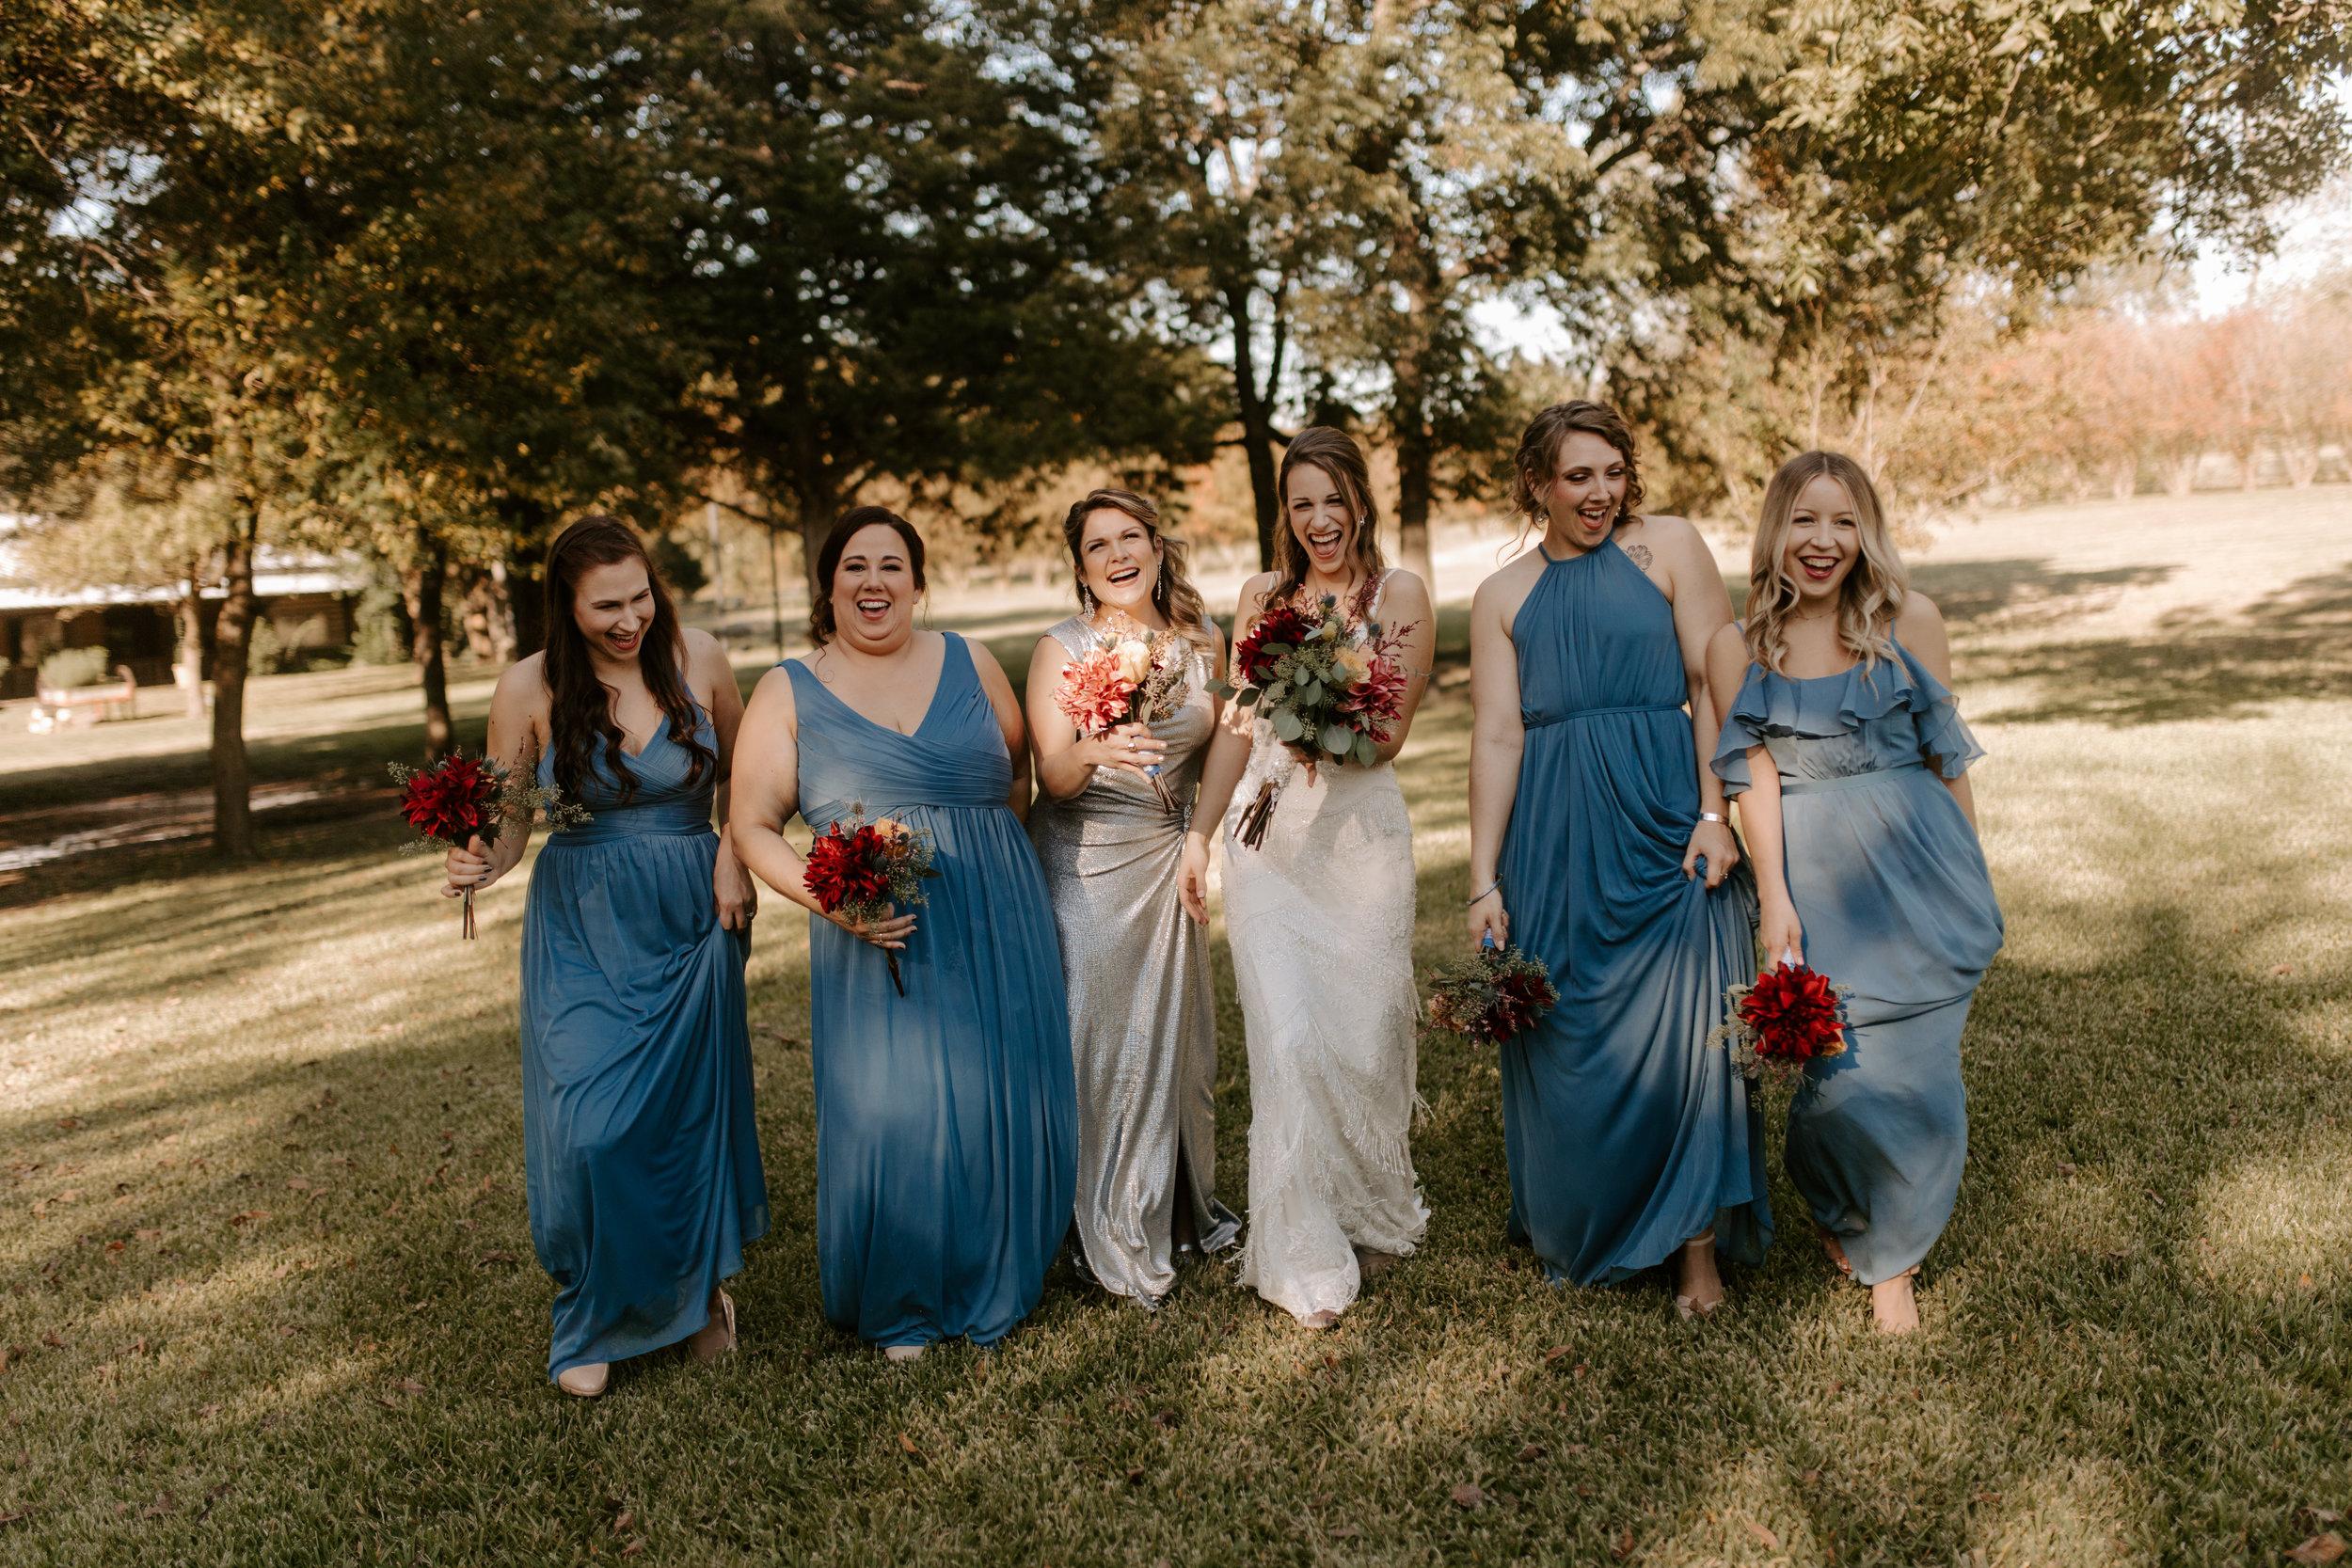 Worley Wedding - Arden and Eric - Wedding Photos - Sneak Peek -Meme Urbane Photography_-3.jpg